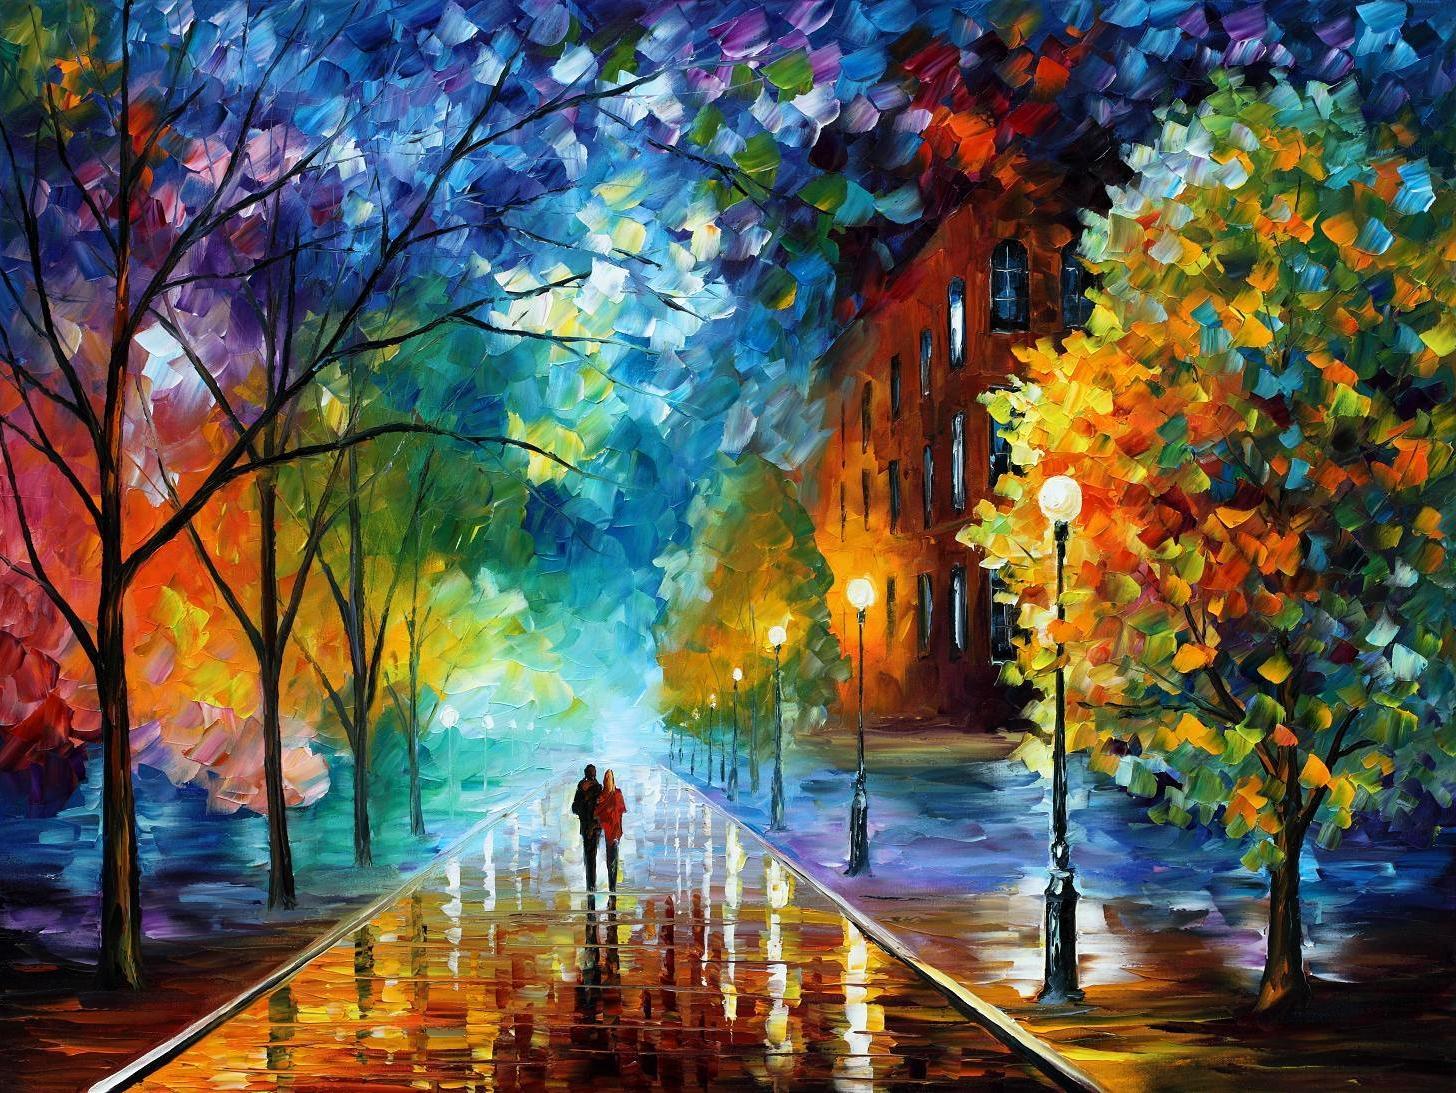 https://2.bp.blogspot.com/-Mn3mbtjY0_I/UTdNYlkJMpI/AAAAAAAAAhA/icQeiE6G6HM/s1600/paintings_leonid_afremov_desktop_1456x1093_wallpaper-408036.jpg